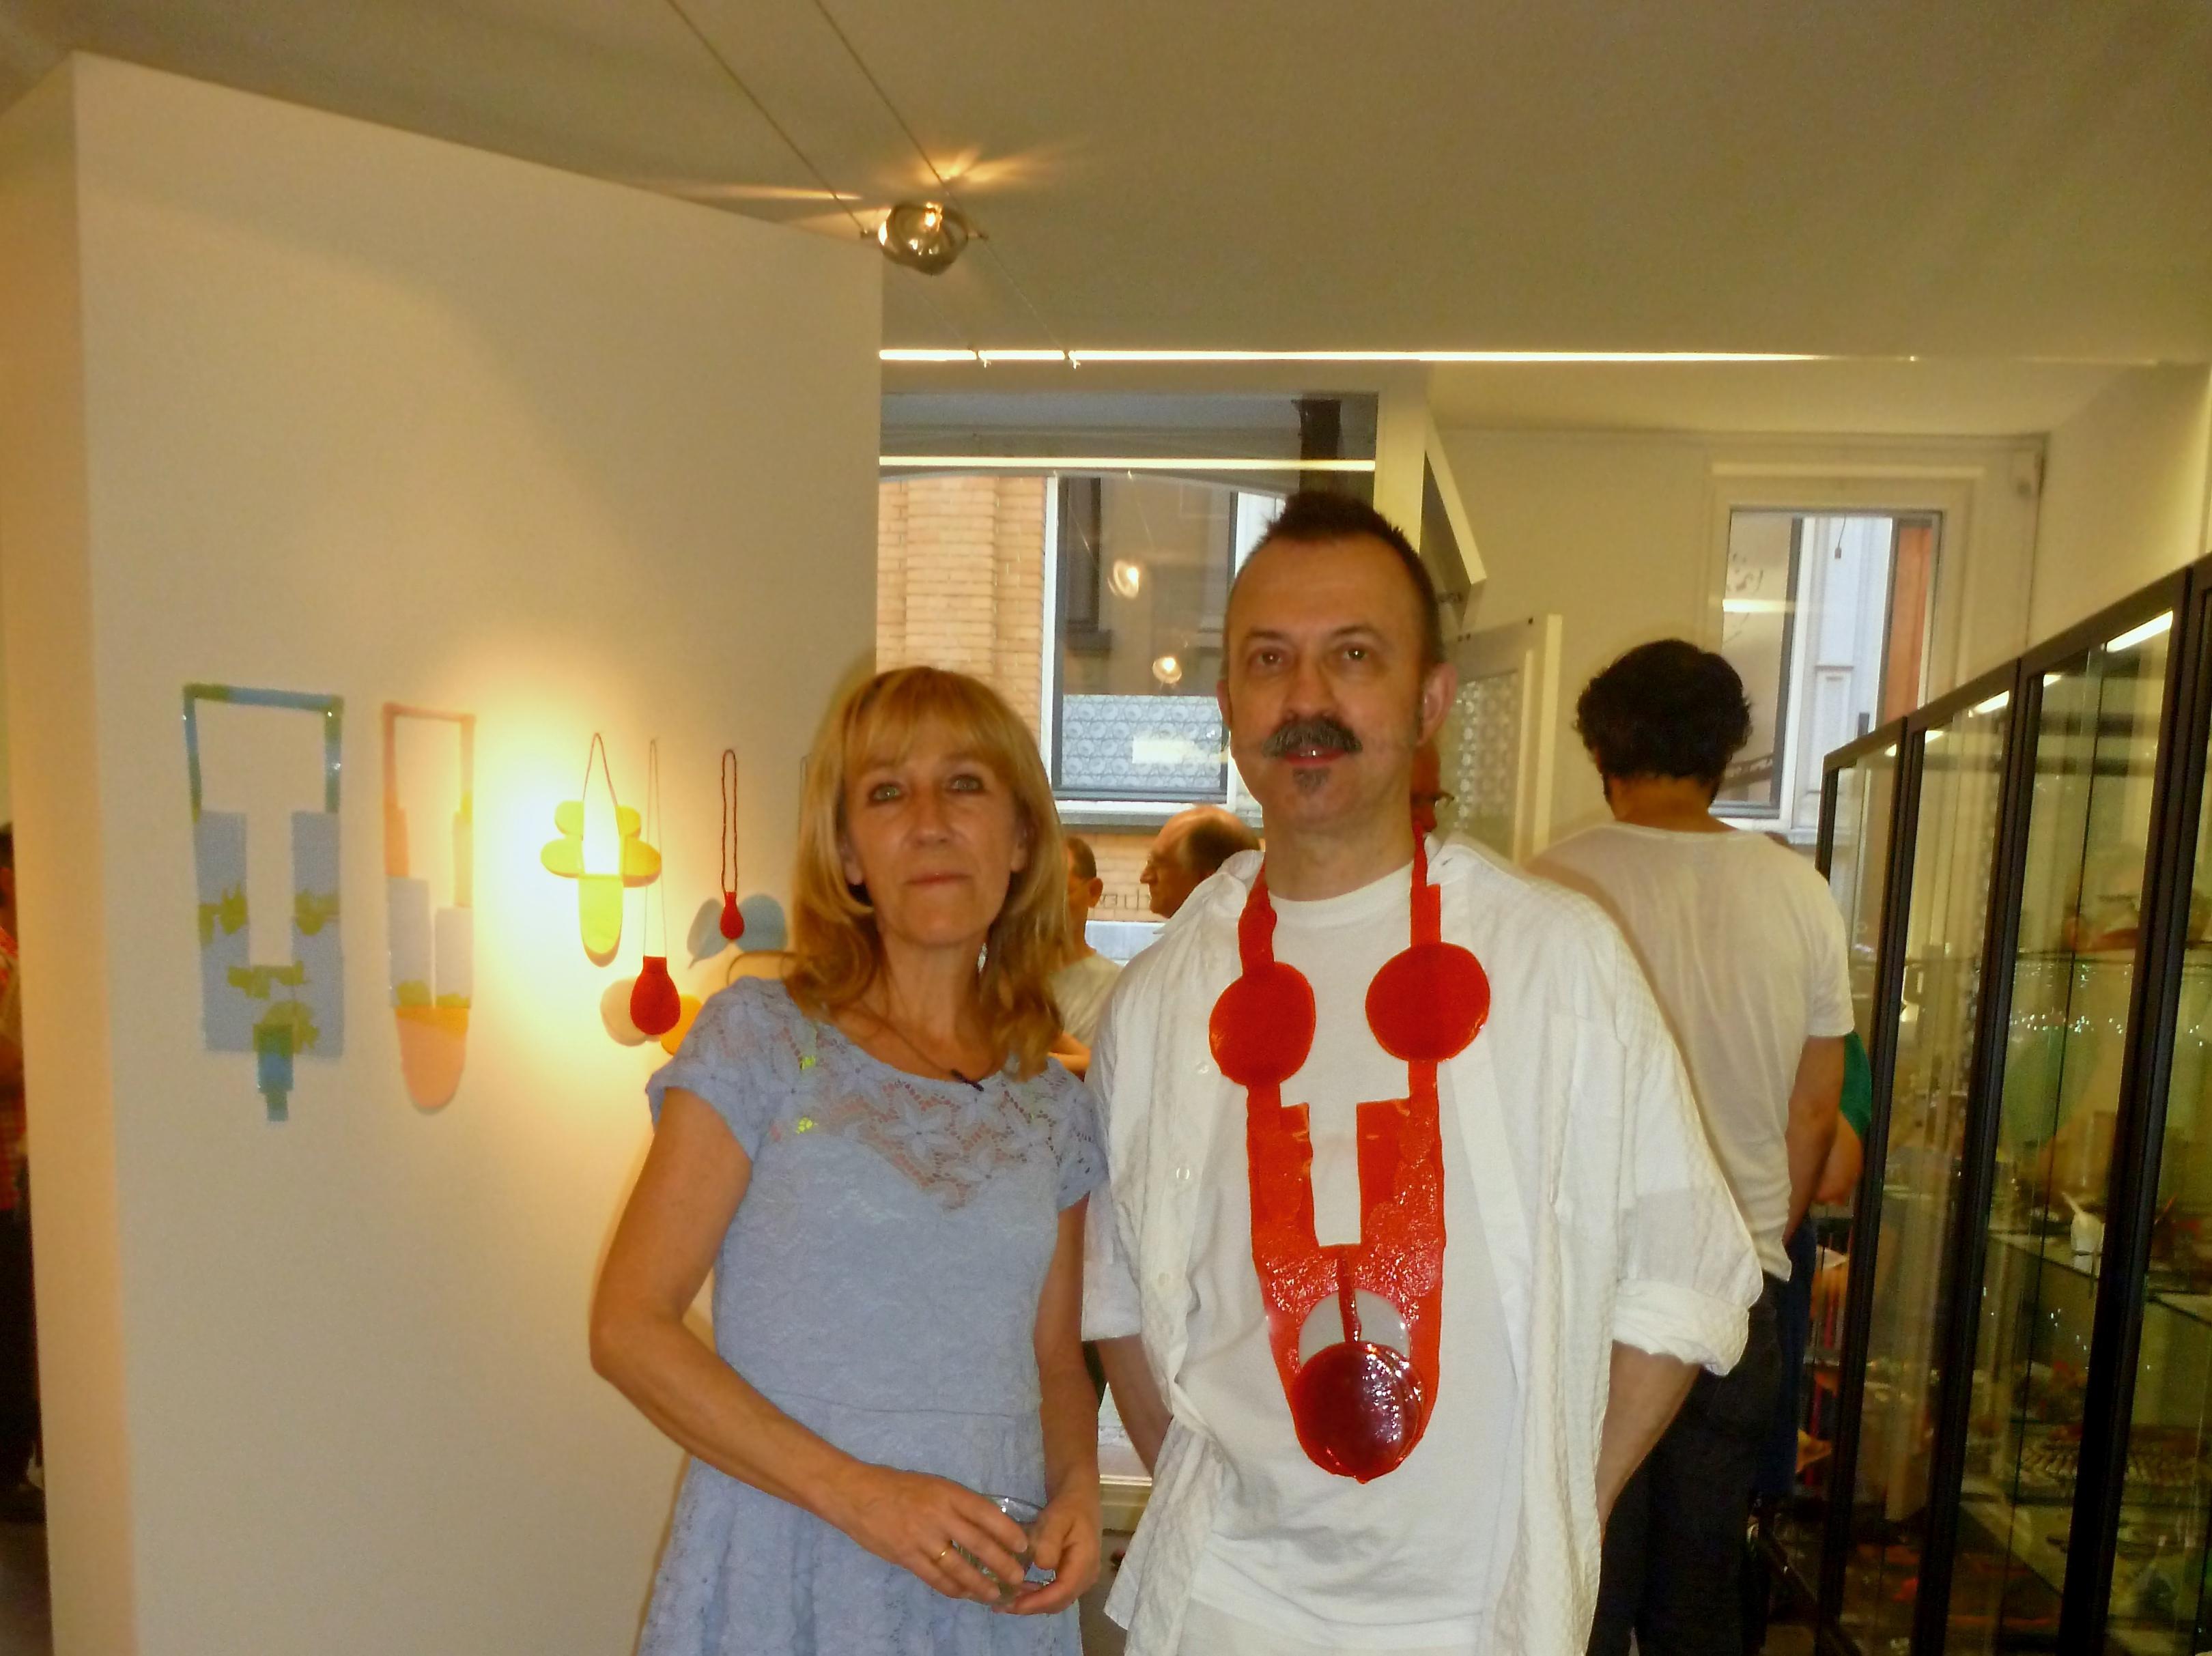 Ela Bauer en Paul Derrez in Galerie Ra, halssieraad, 2012, tentoonstelling, portret